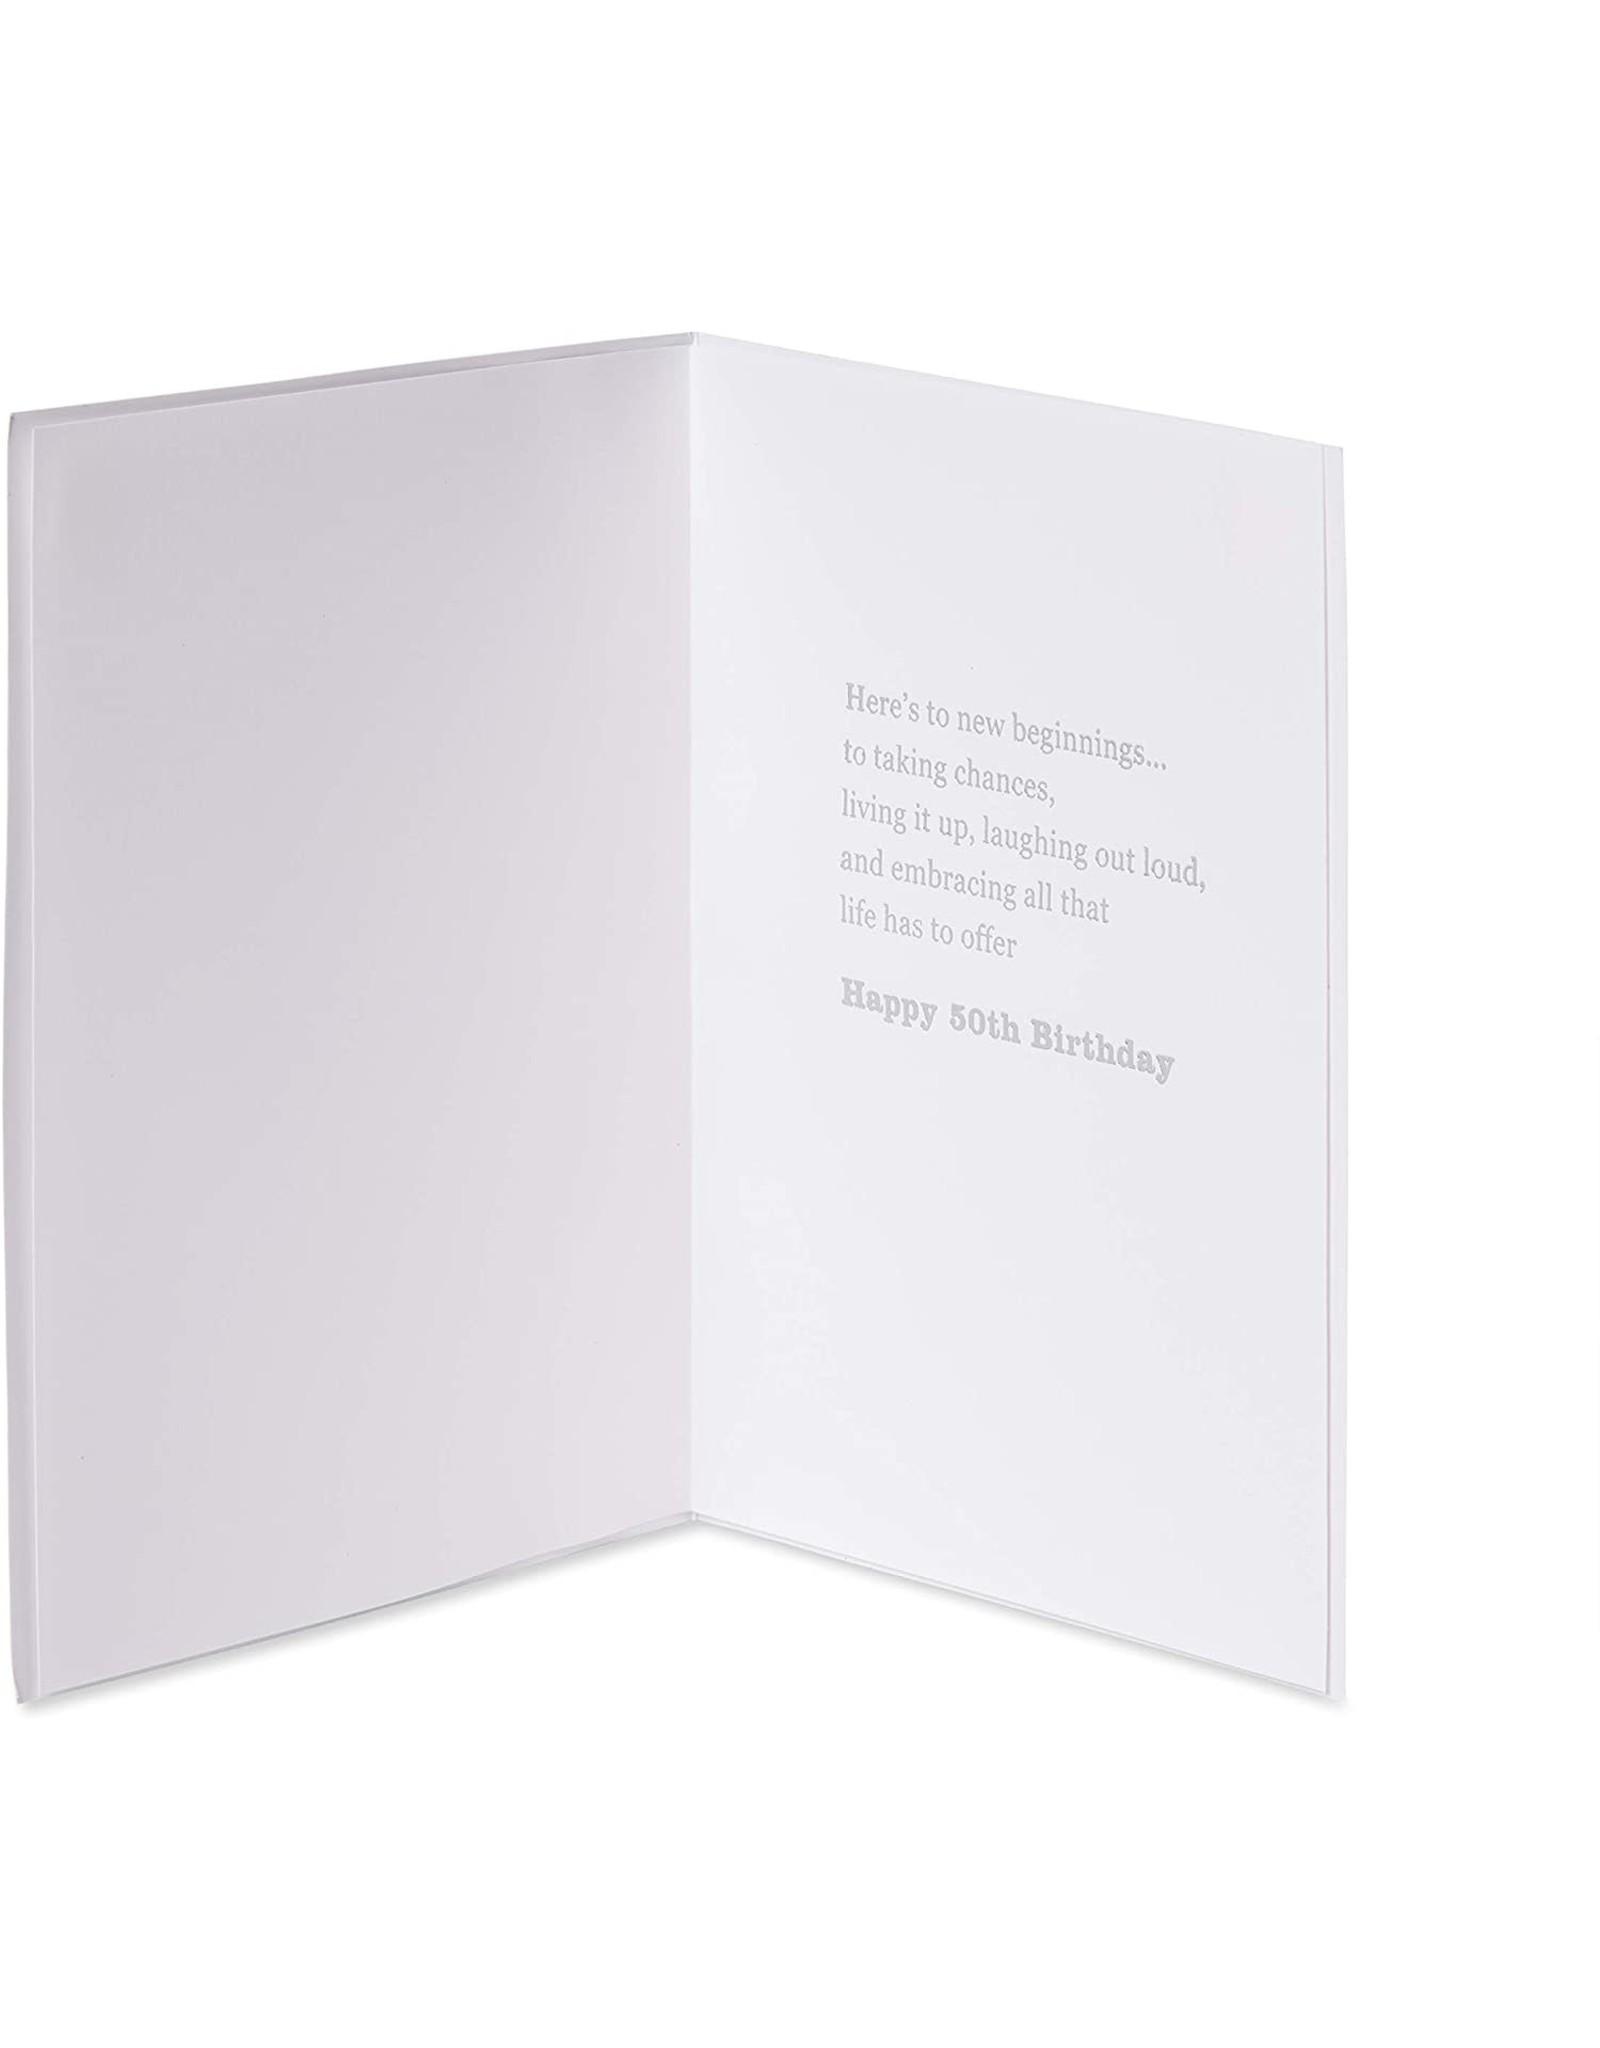 PAPYRUS® Birthday Card 50th Watercolor 50th Birthday